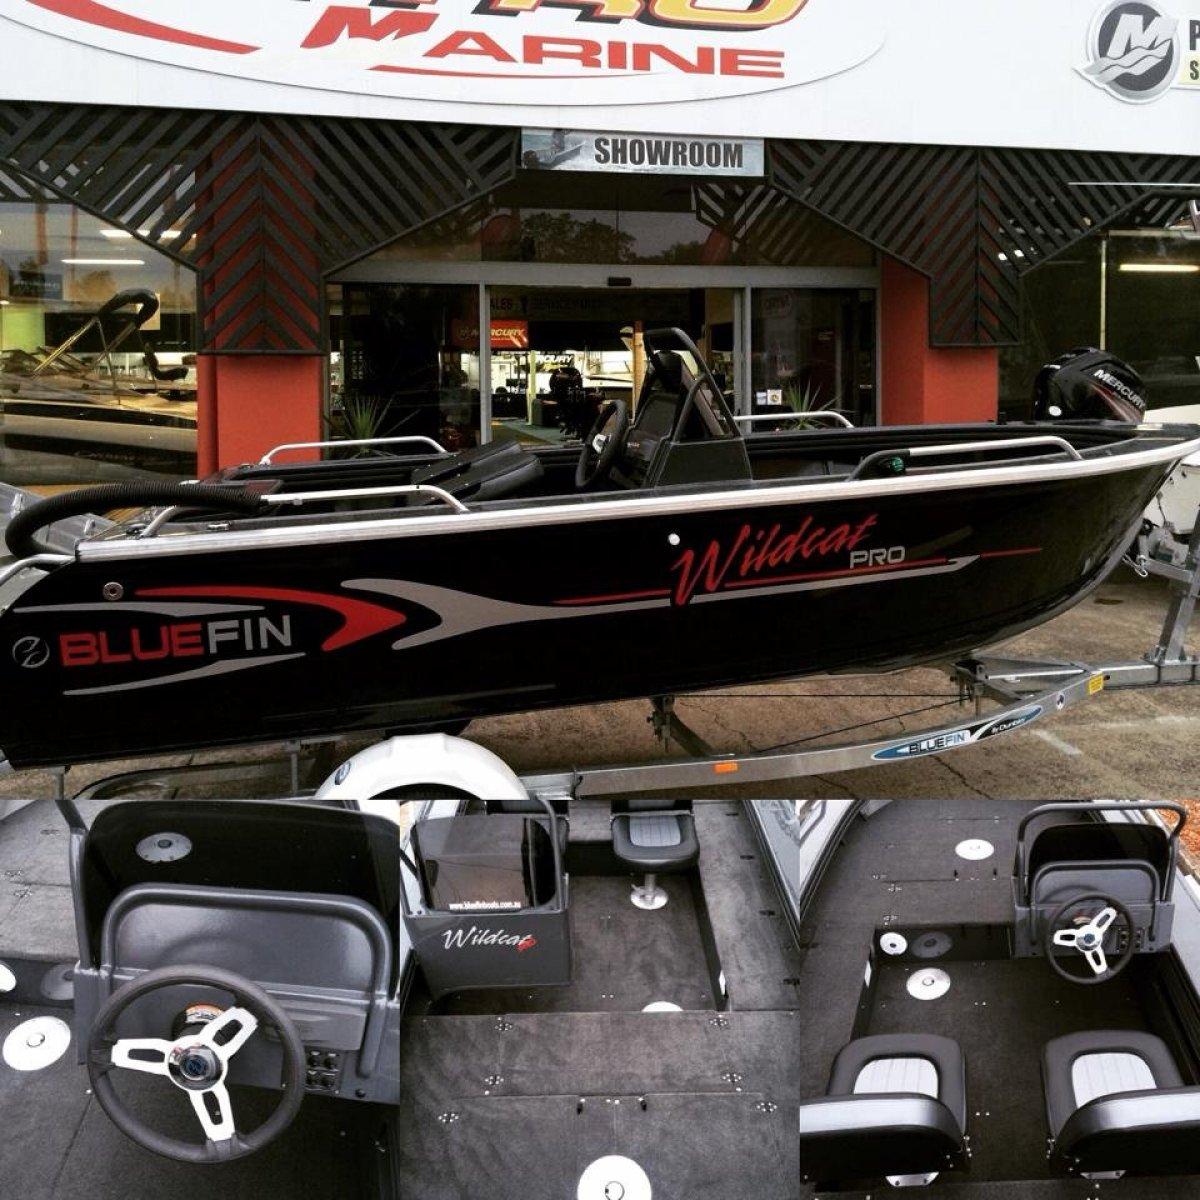 New Bluefin 4.55 Wildcat Pro